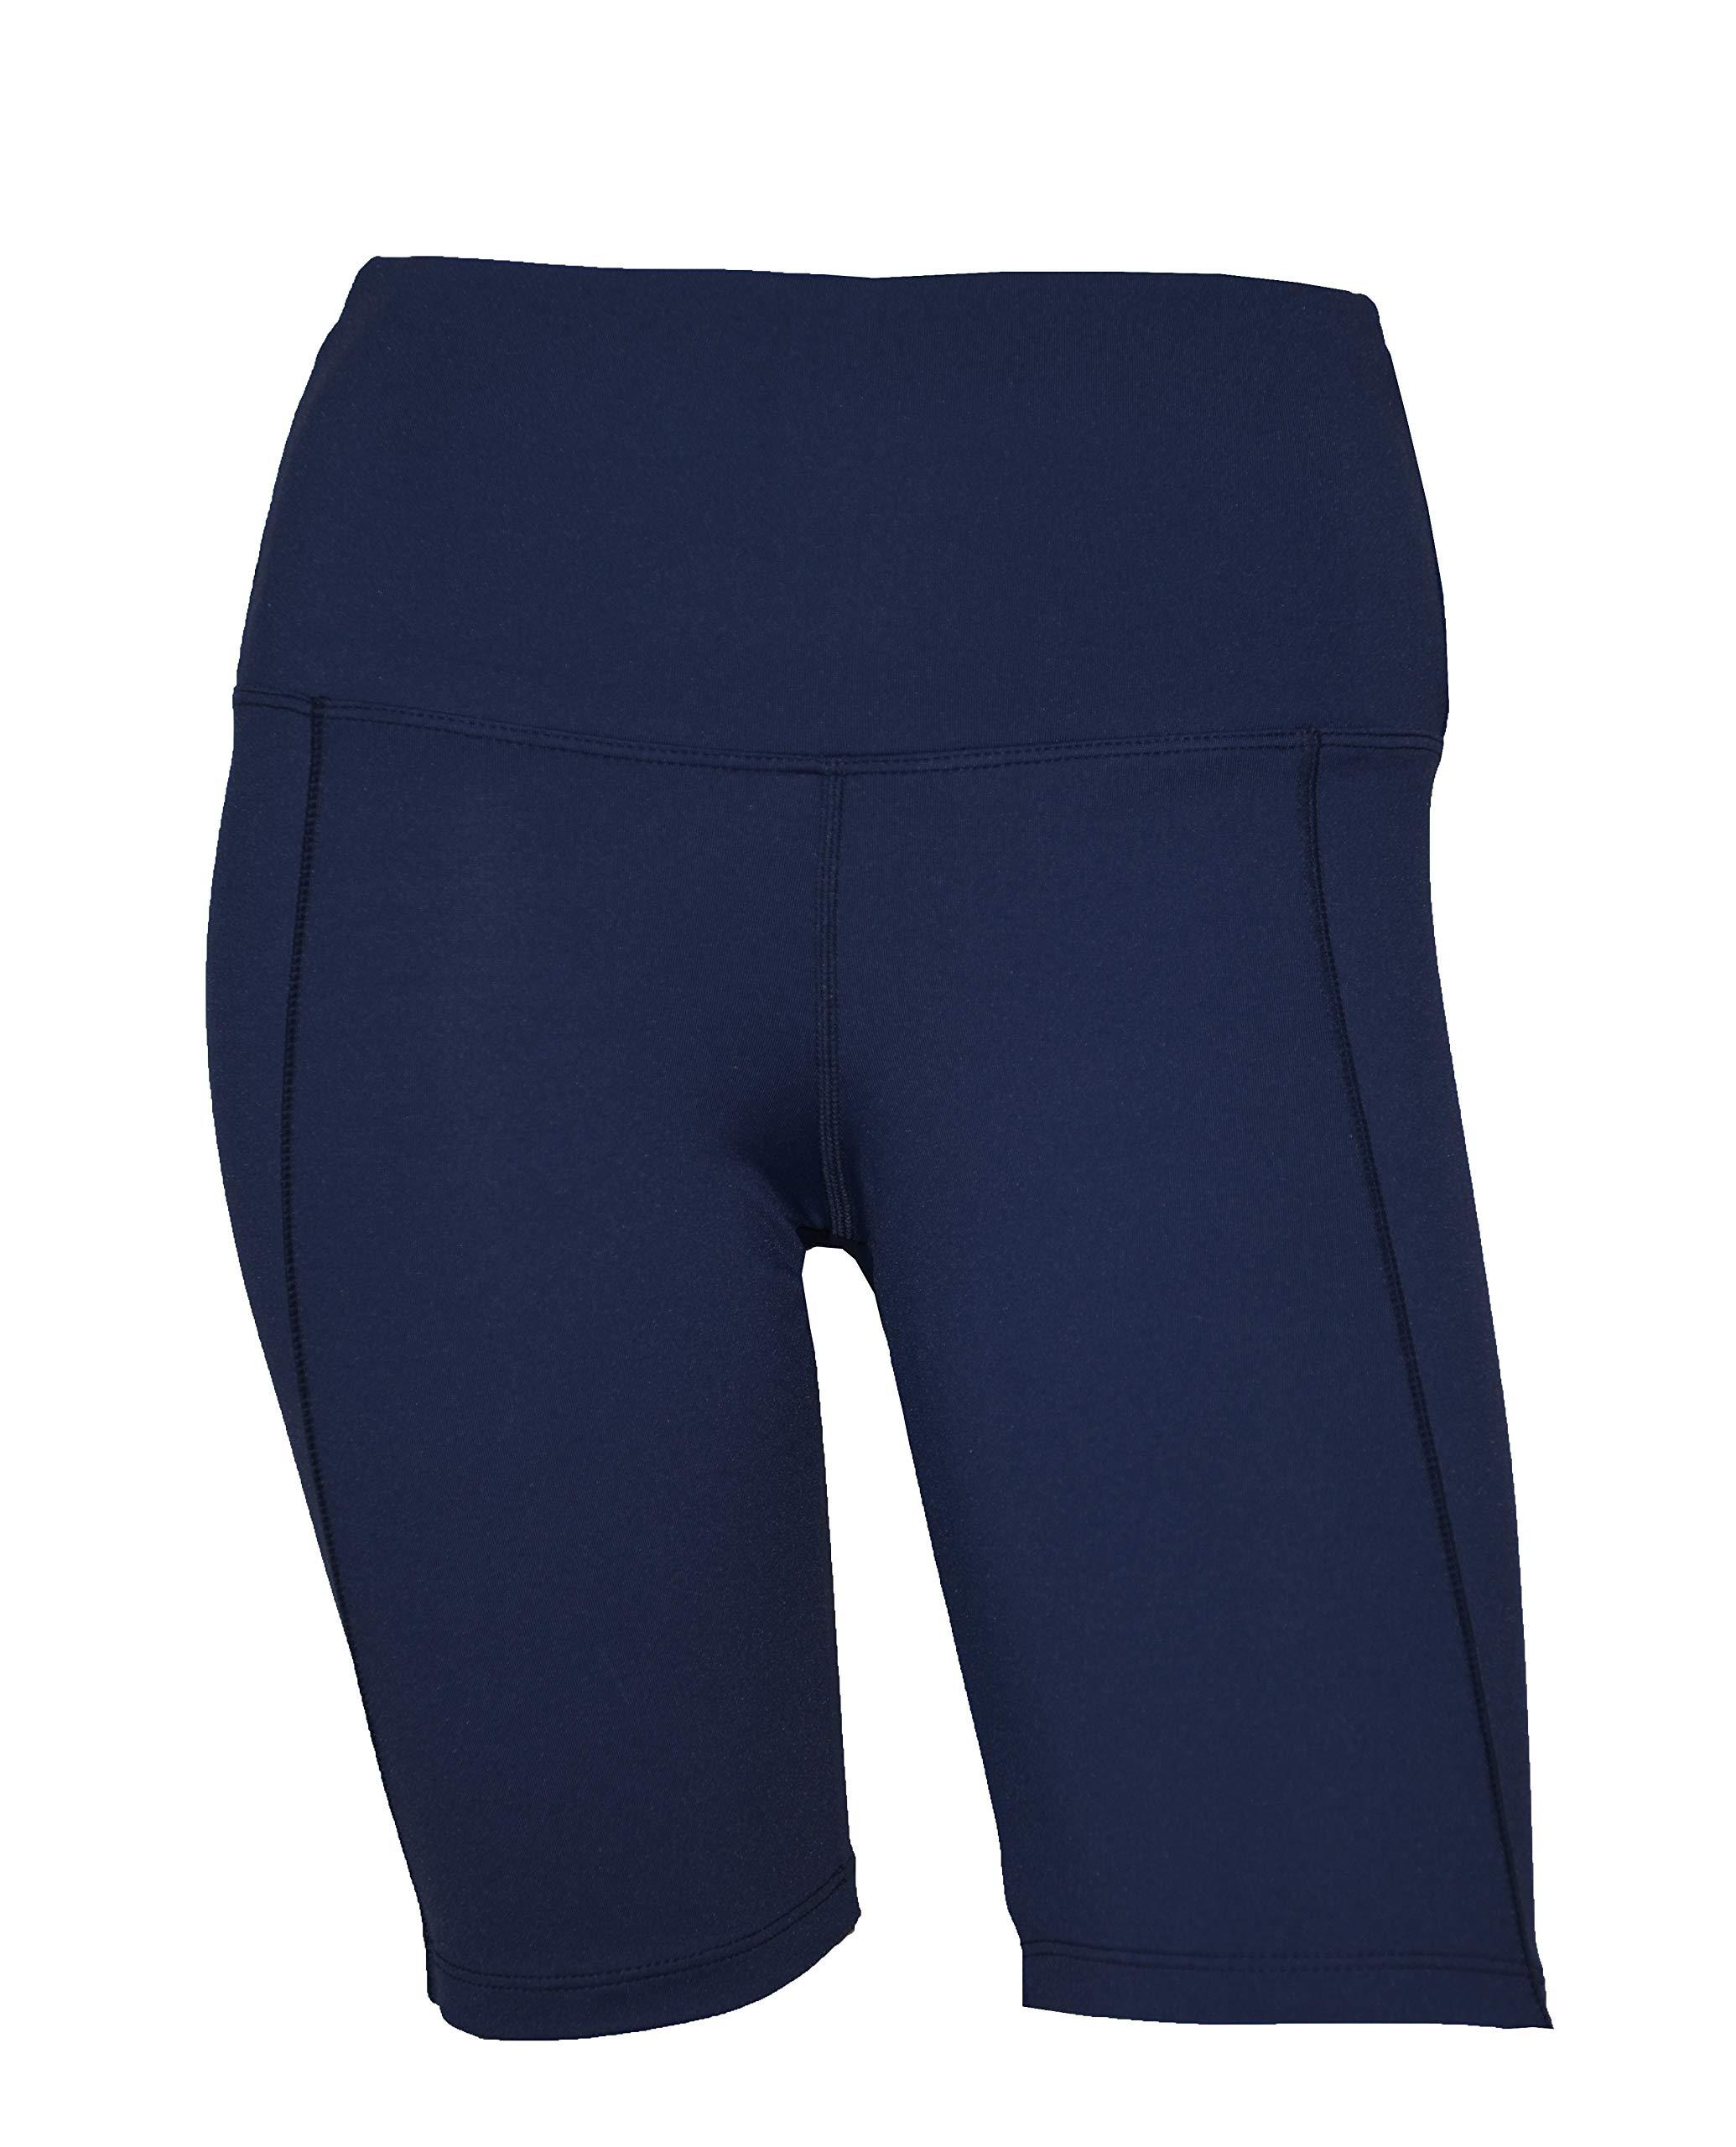 Private Island Women UV Swim Rash Guard Pocket Shorts Pants Yoga (XXL, Navy) by Private Island